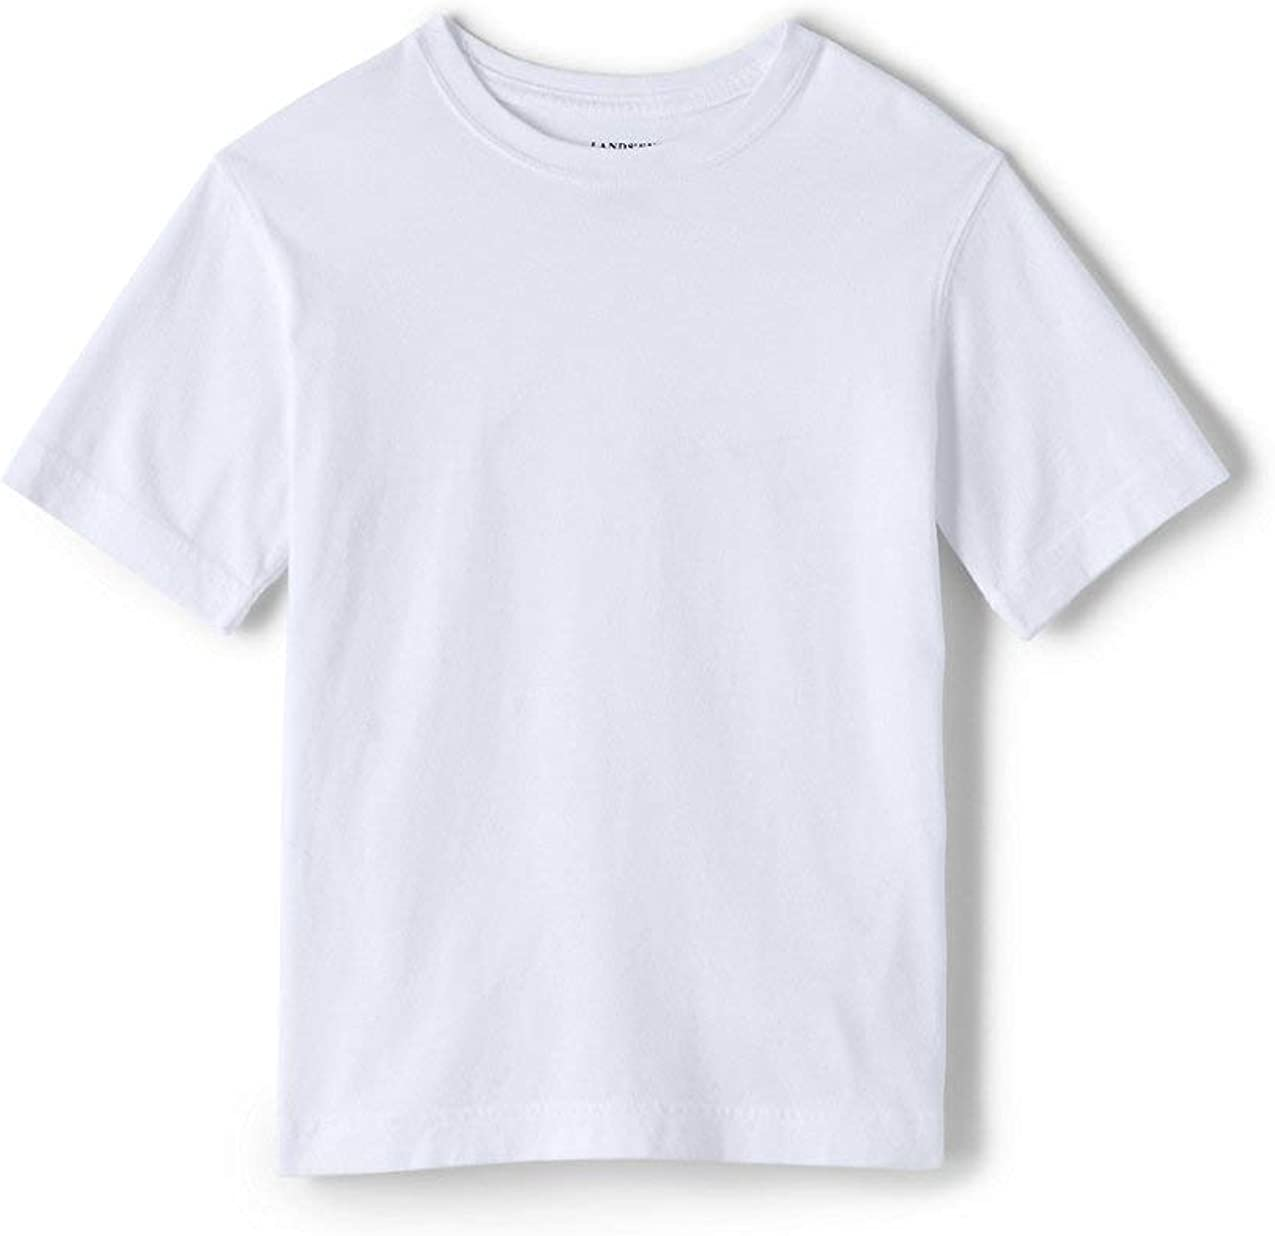 Lands' End School Uniform Boys Short Sleeve Essential T-Shirt